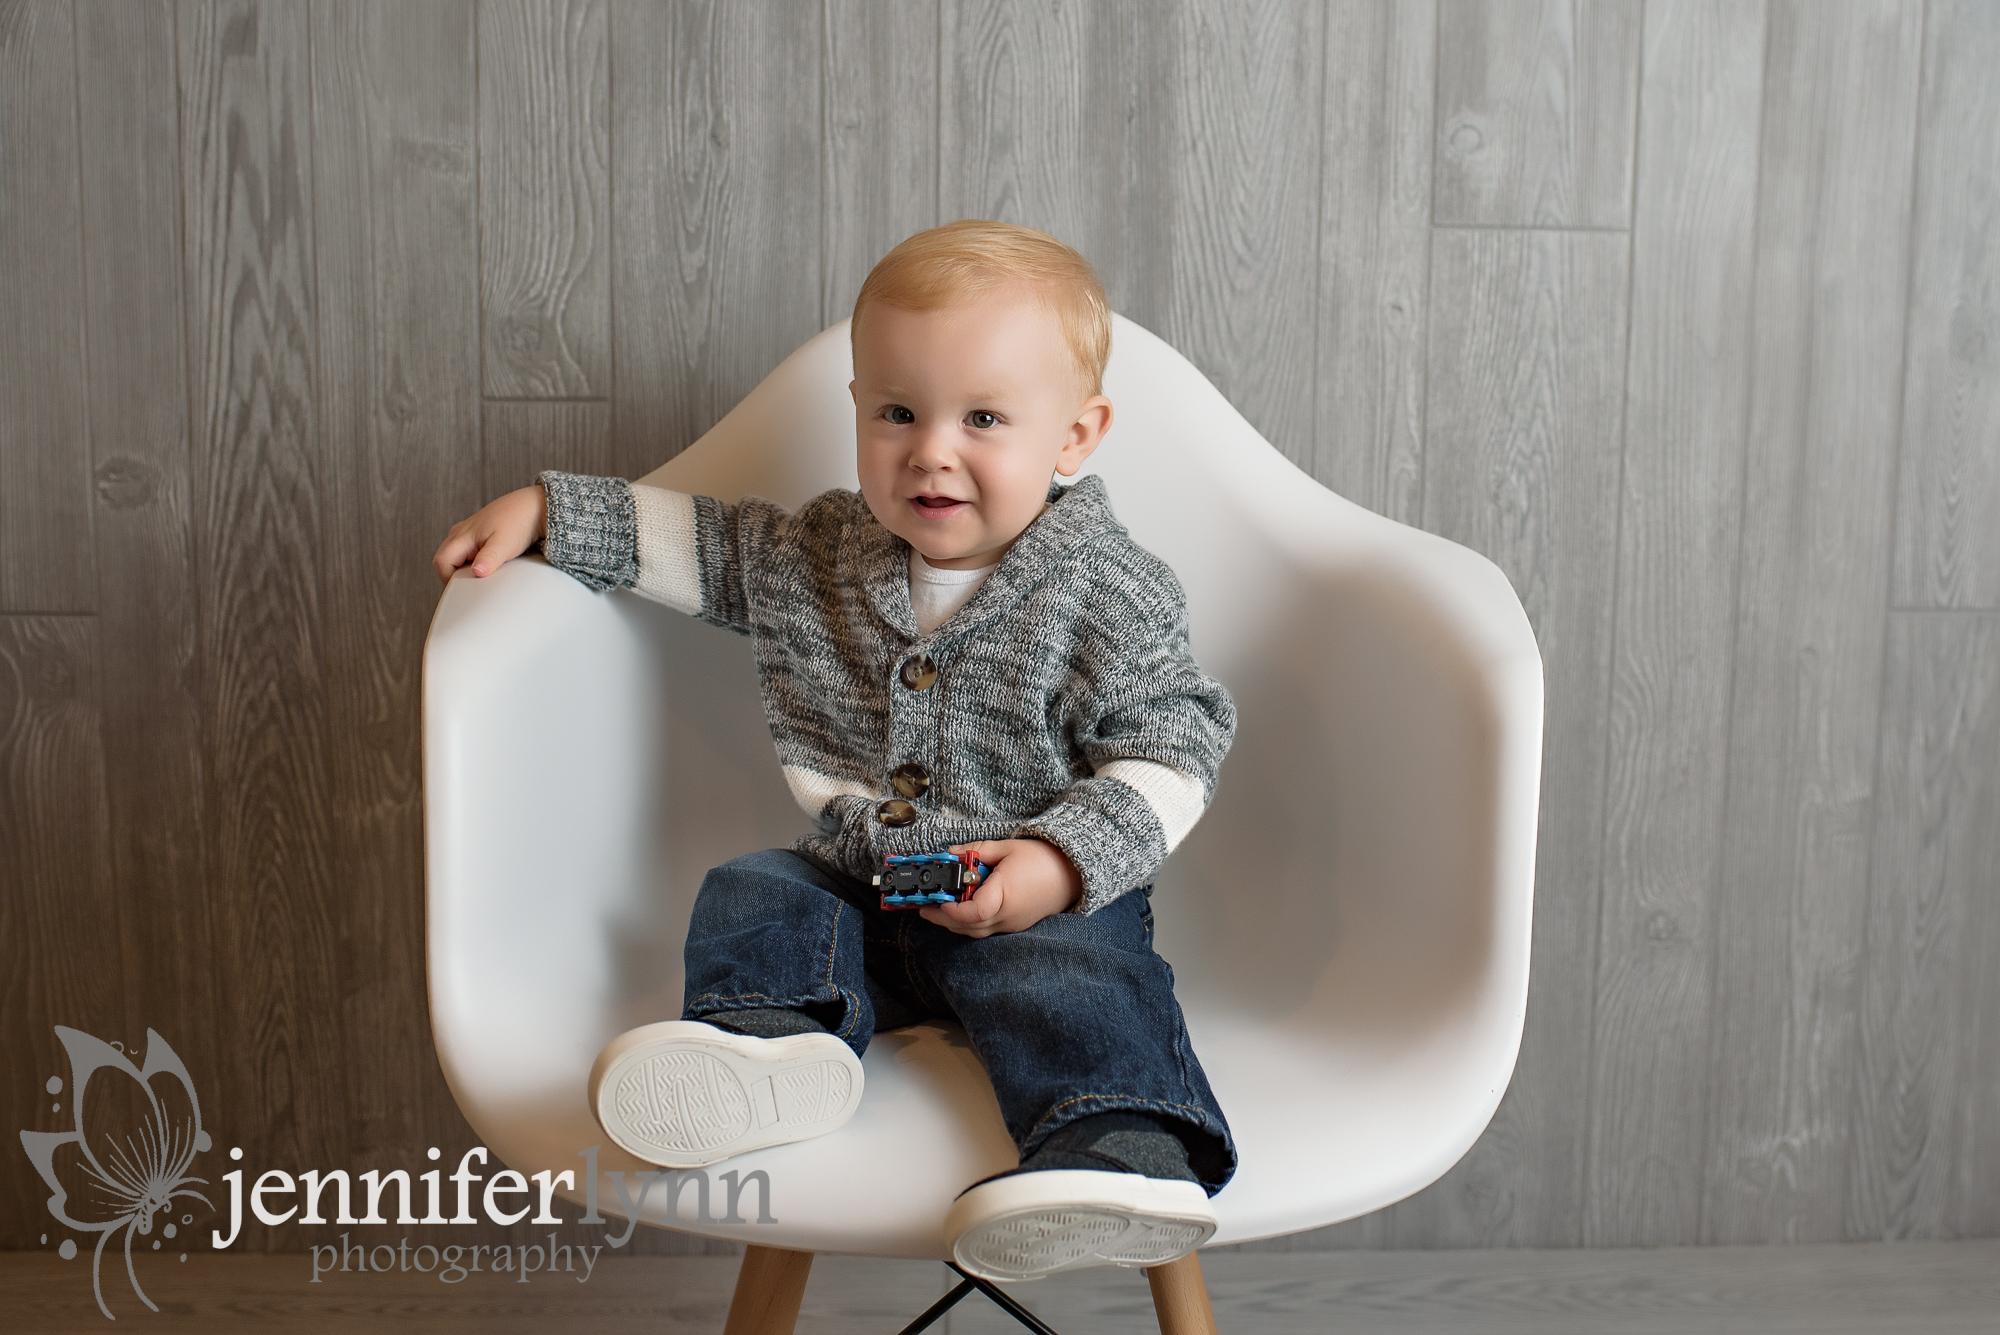 Baby Boy White Chair Studio